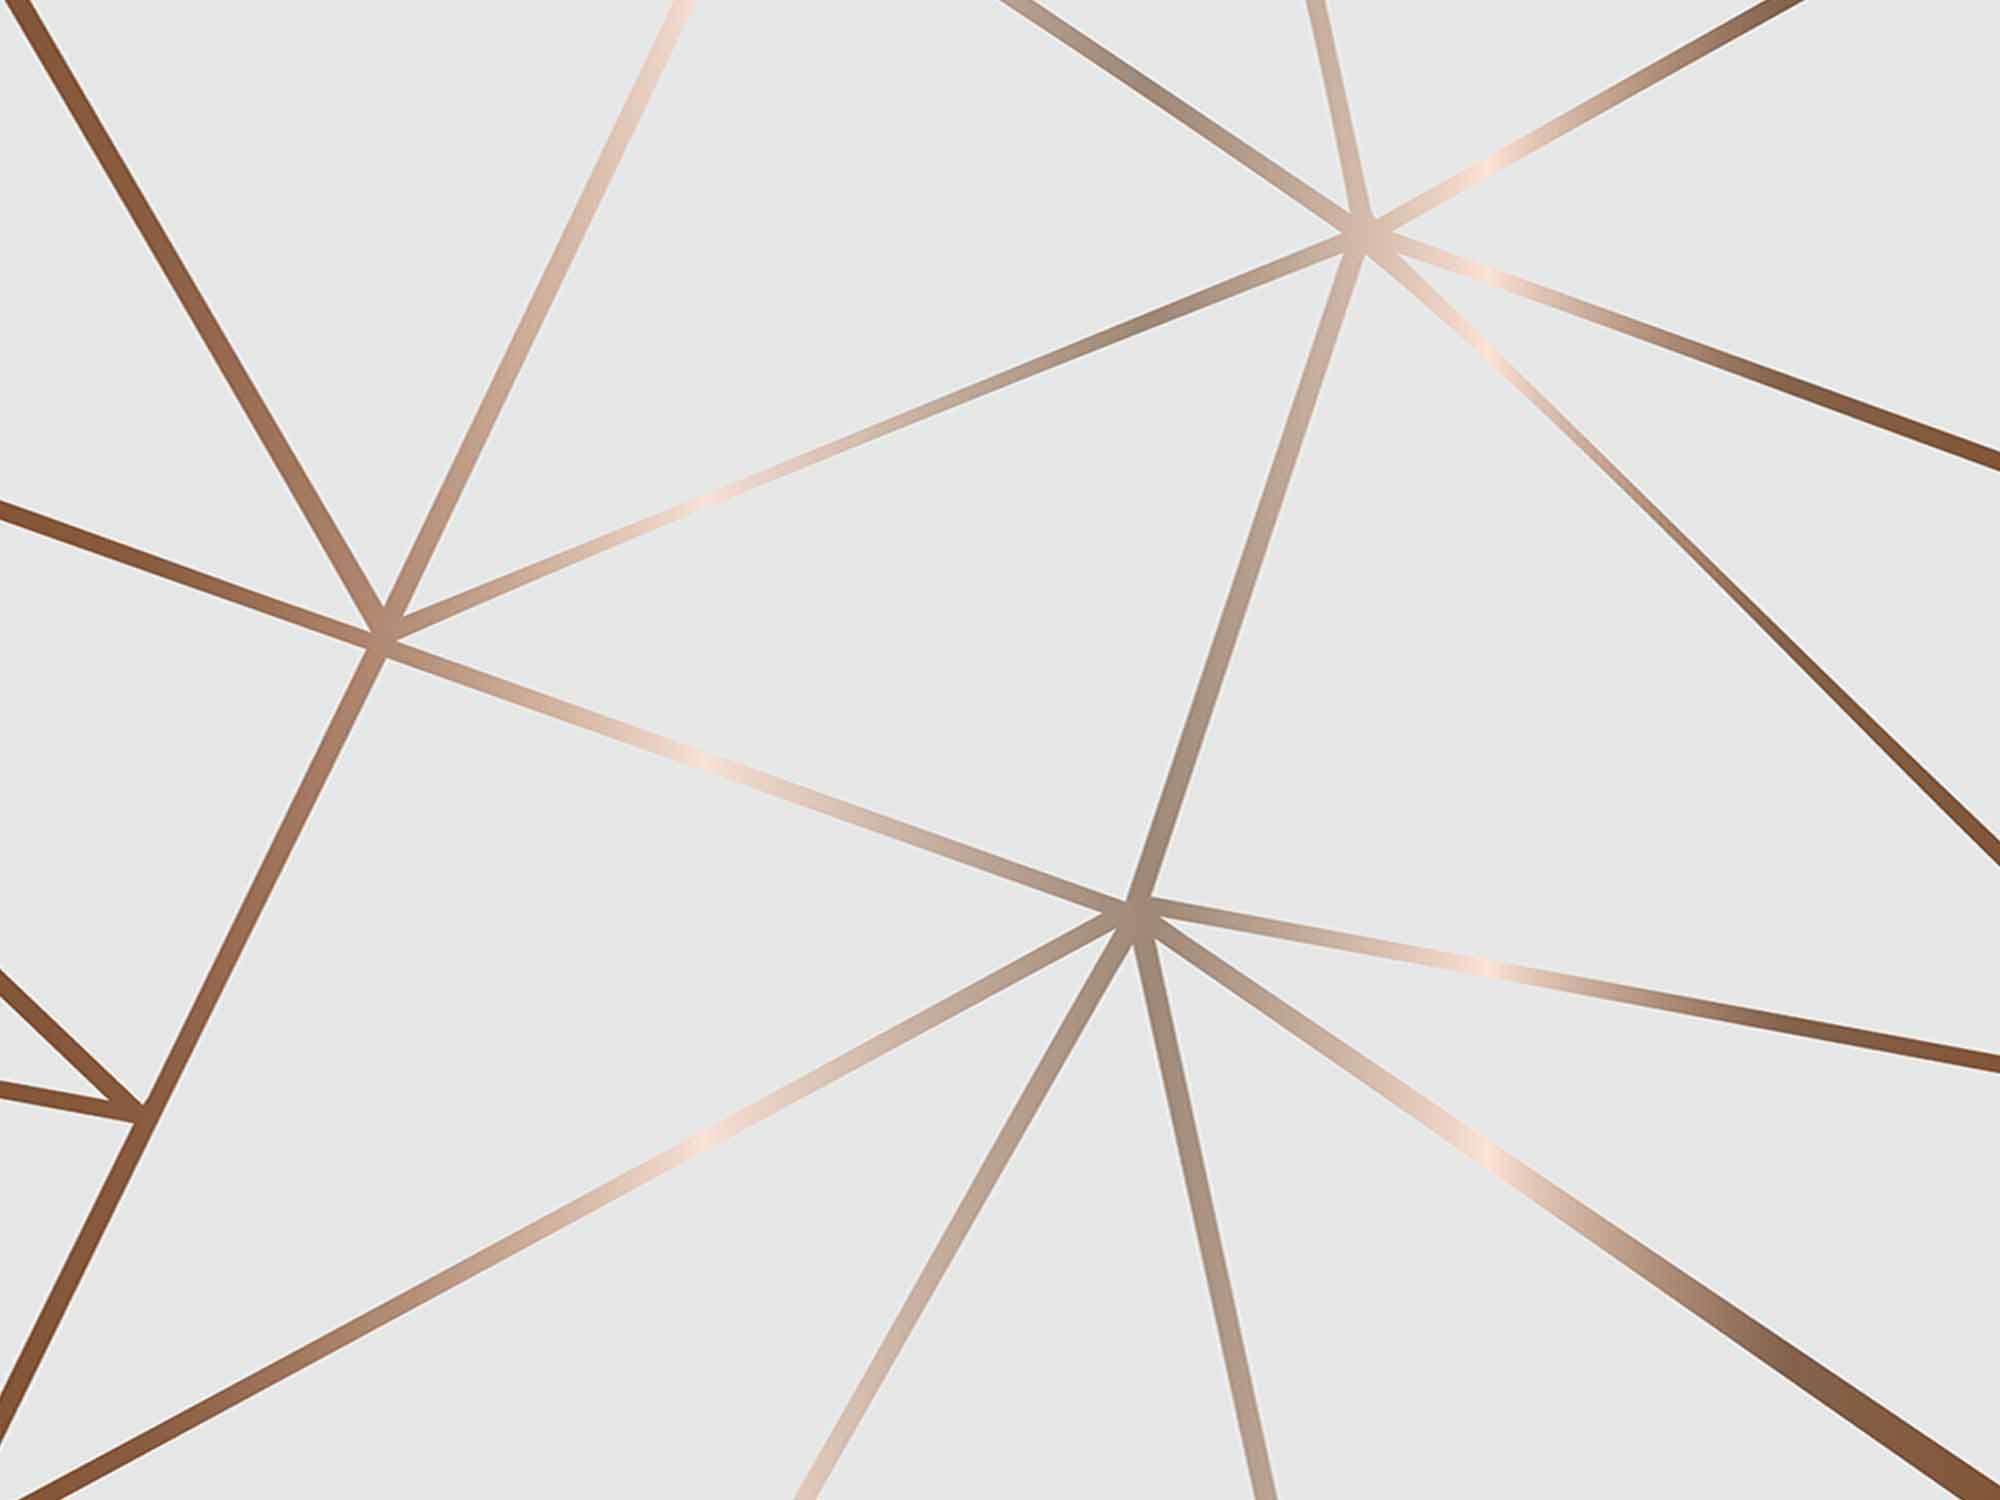 Papel de Parede Zara 0023- Adesivo de Parede  - Paredes Decoradas